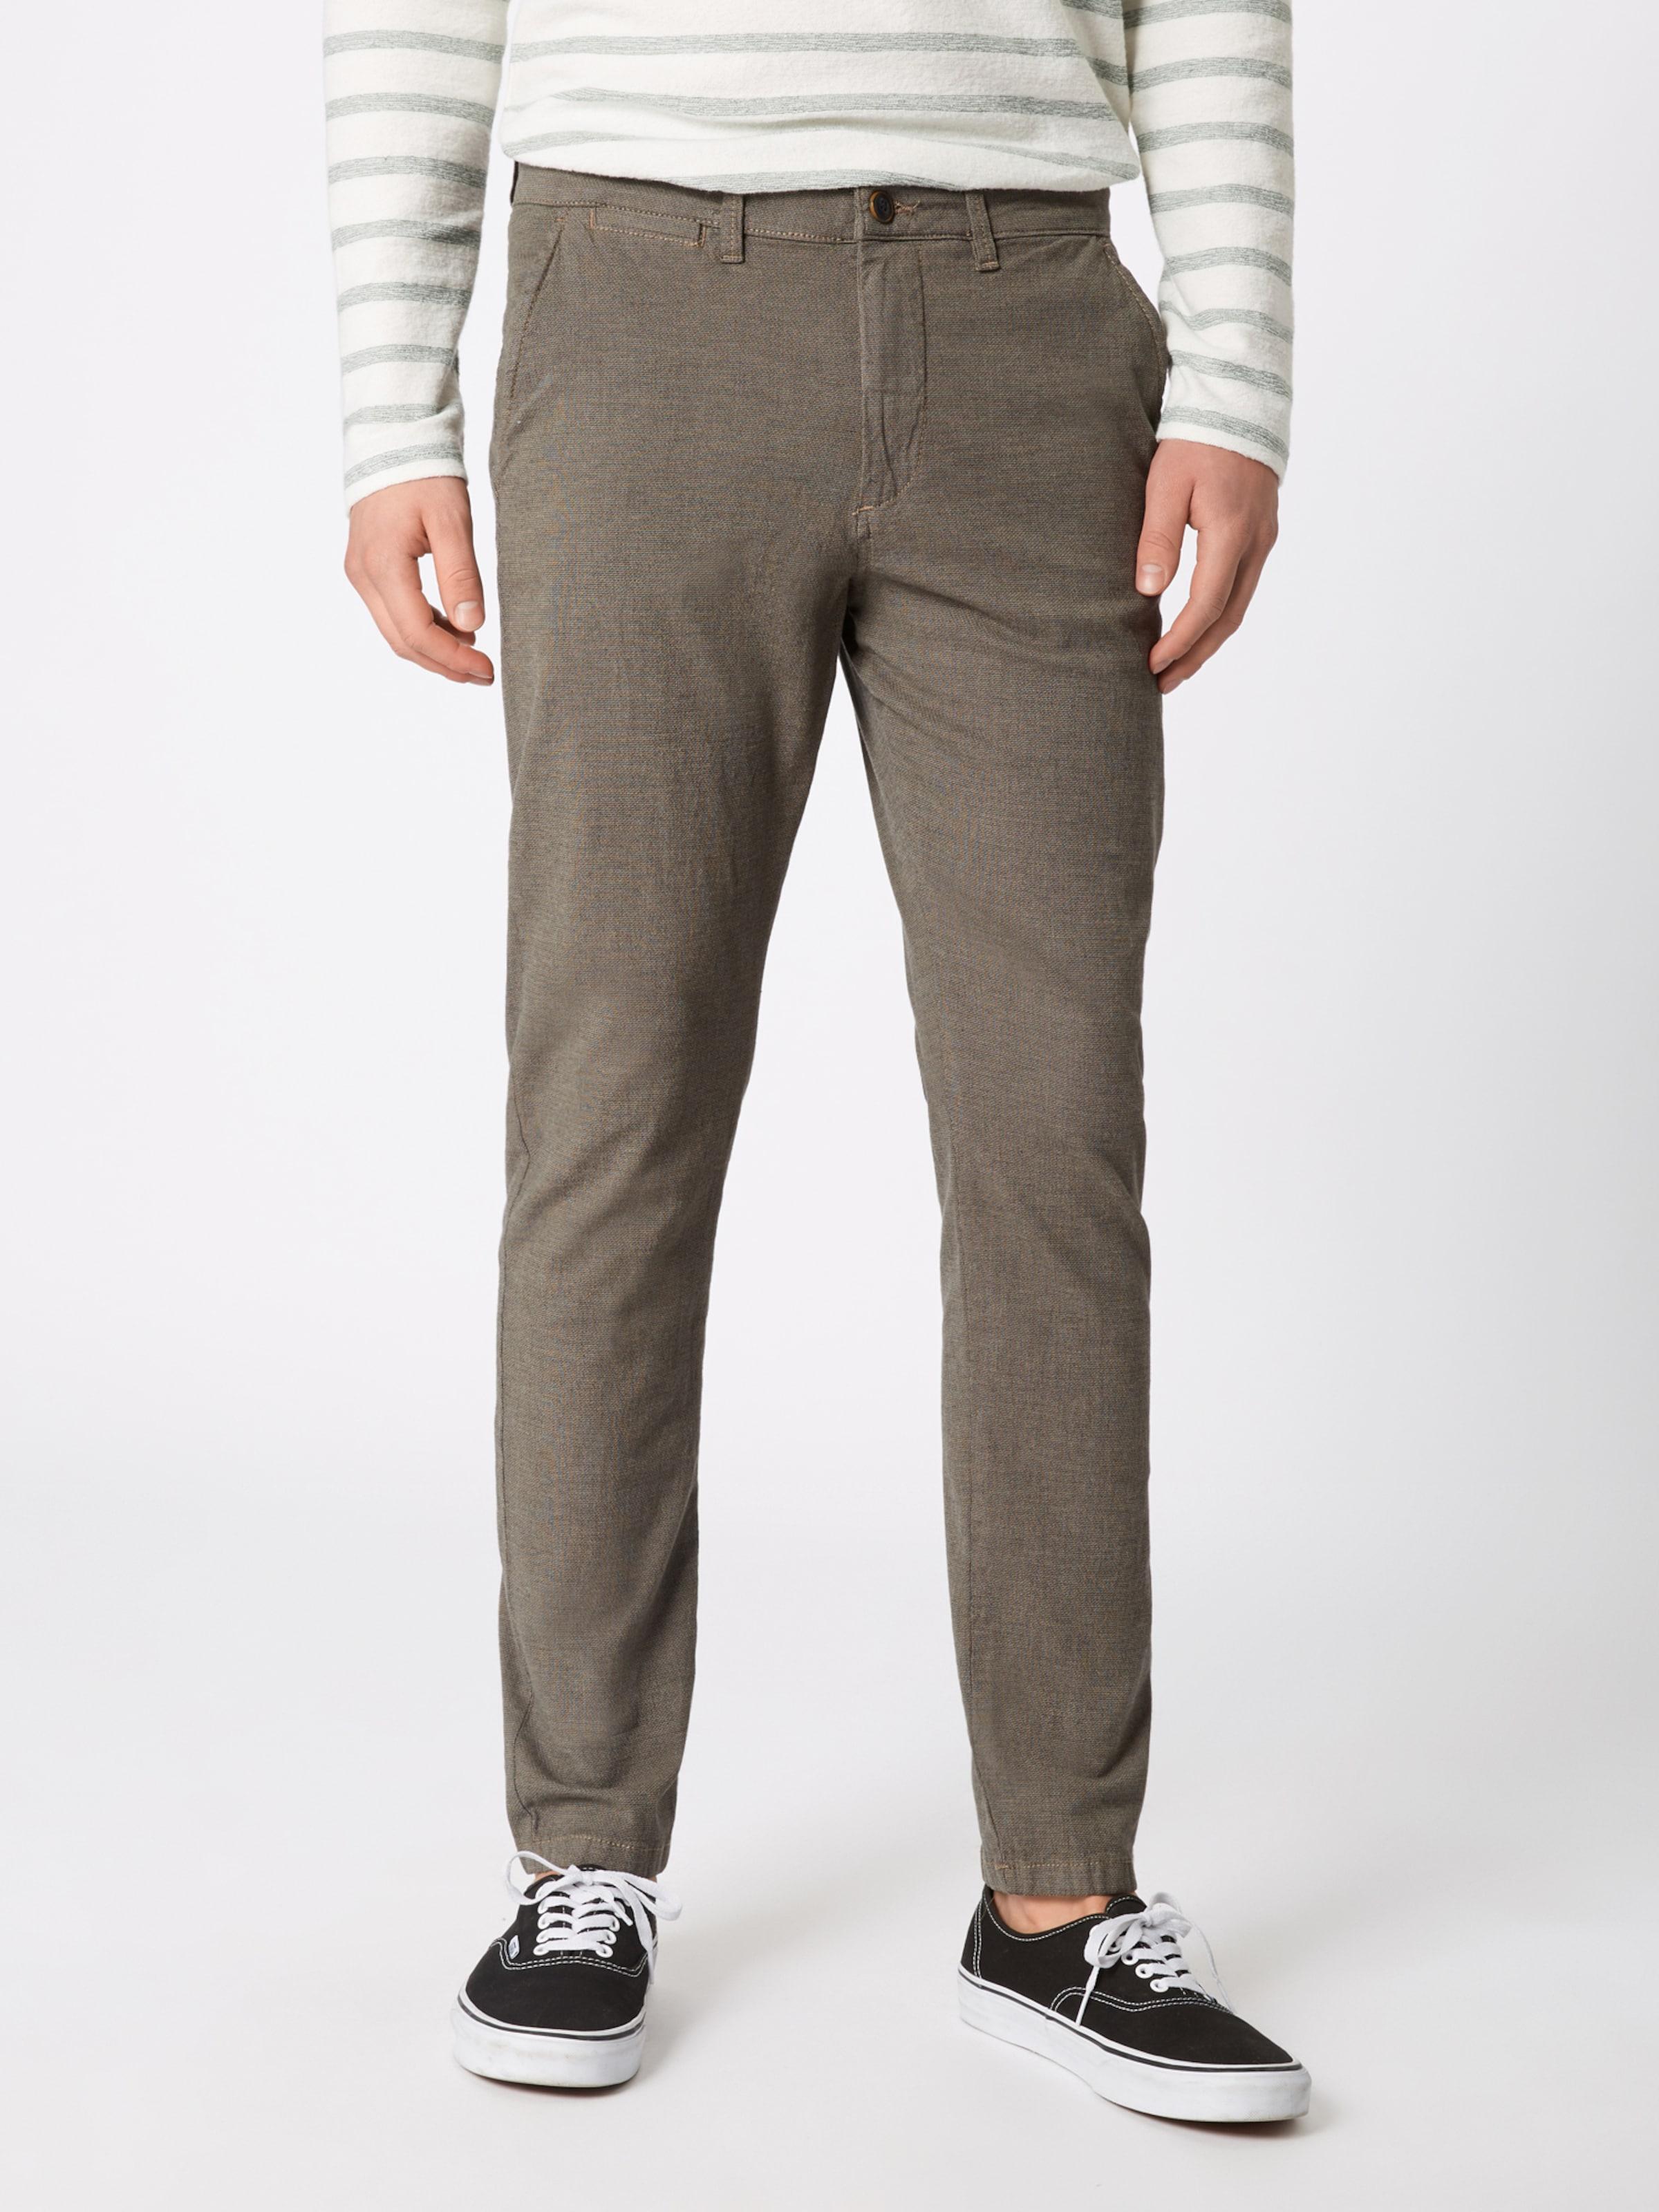 Jones Kenzo' Gris 'marco Foncé Pantalon En Jackamp; fgv6yYb7I